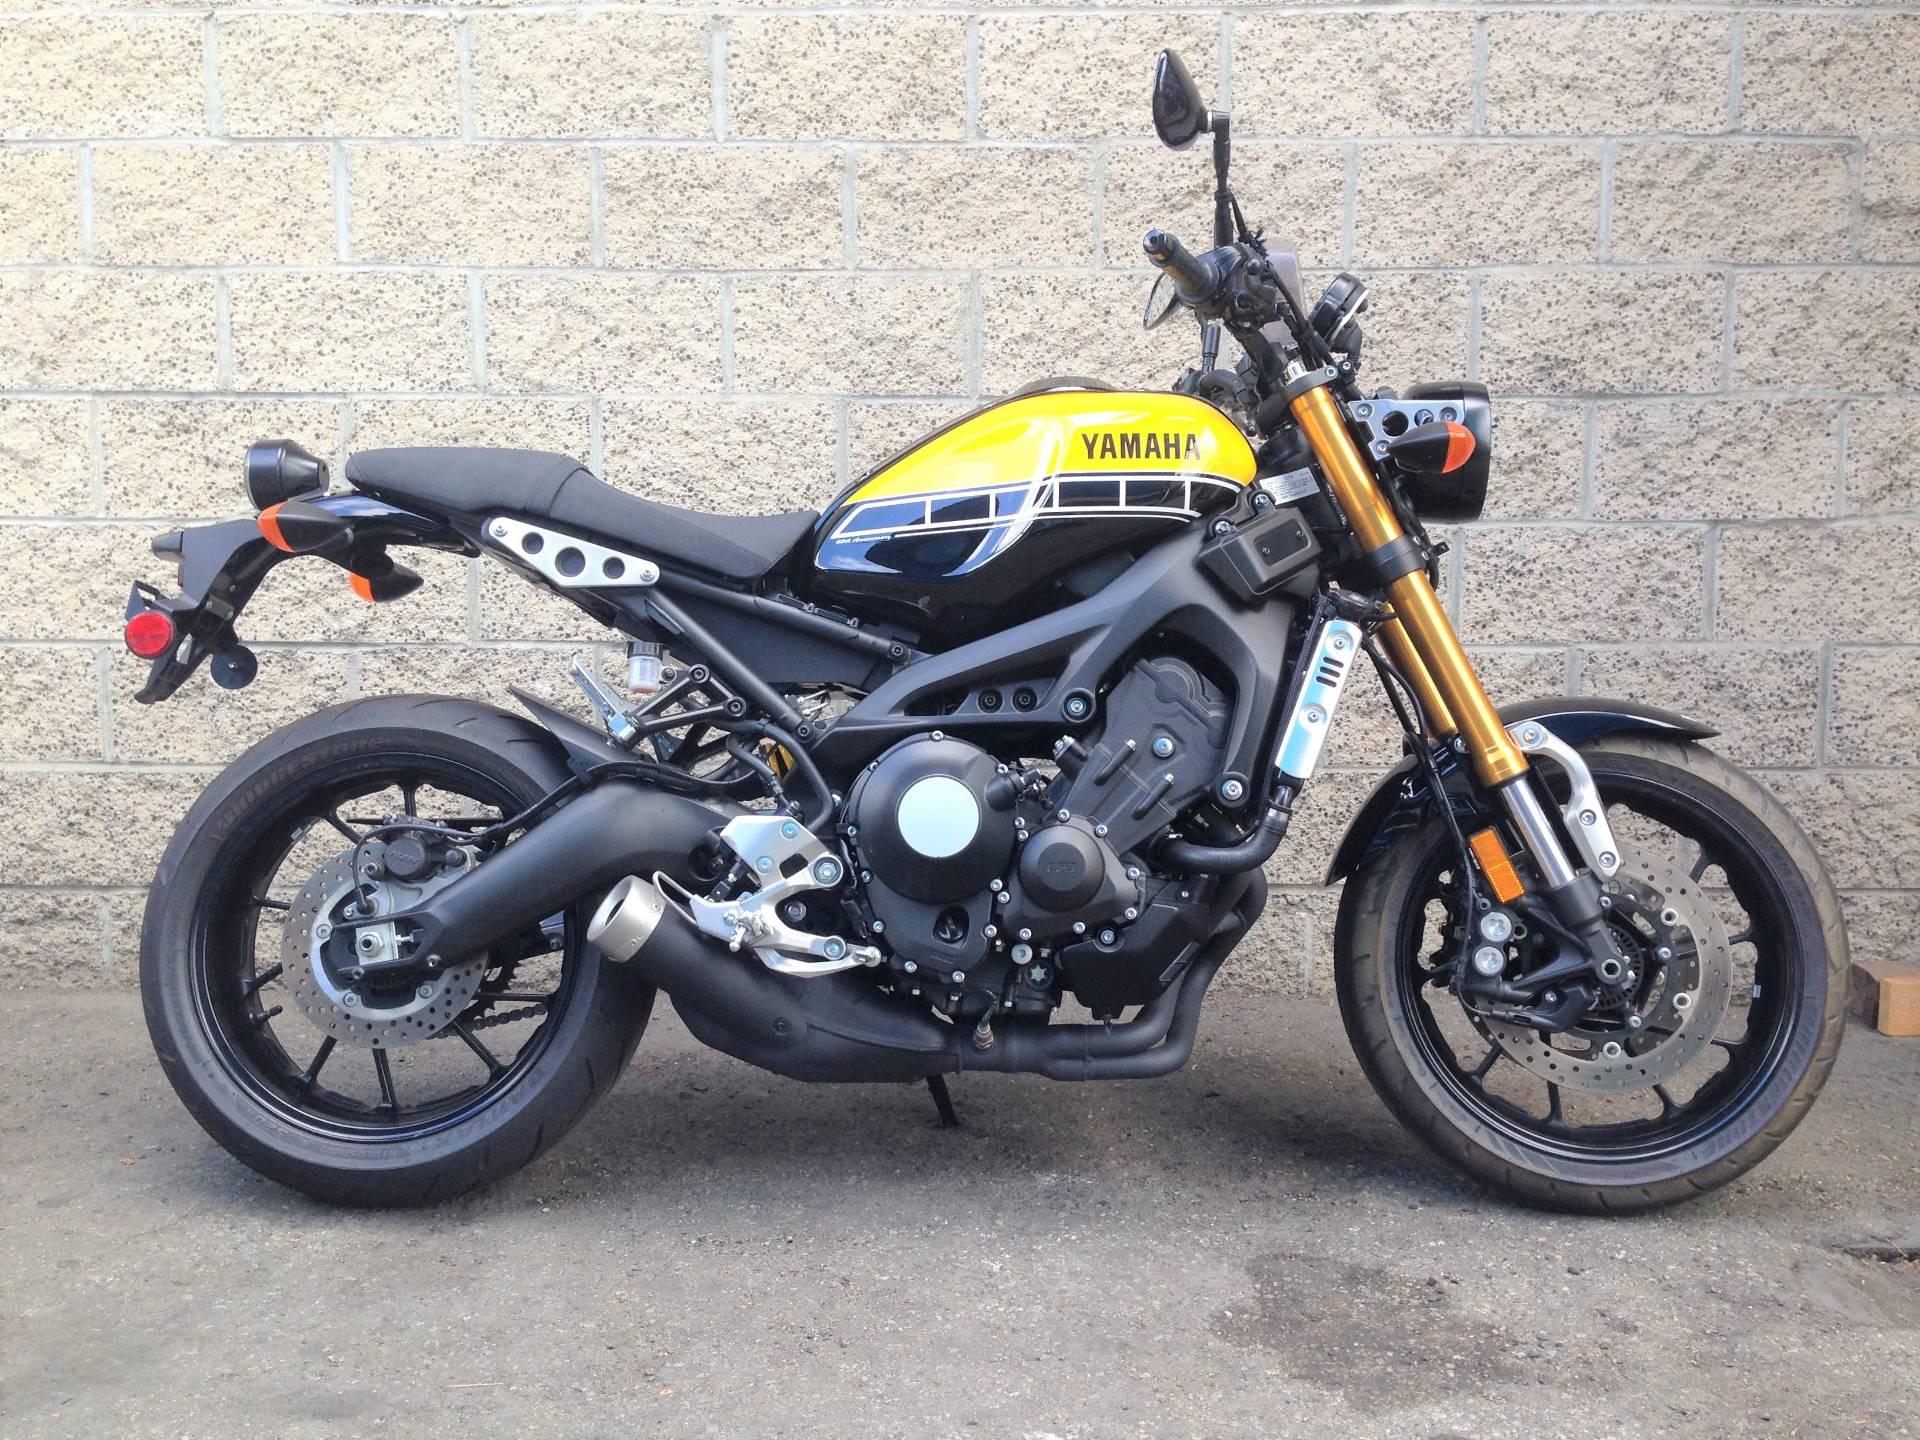 2016 Yamaha XSR900 6